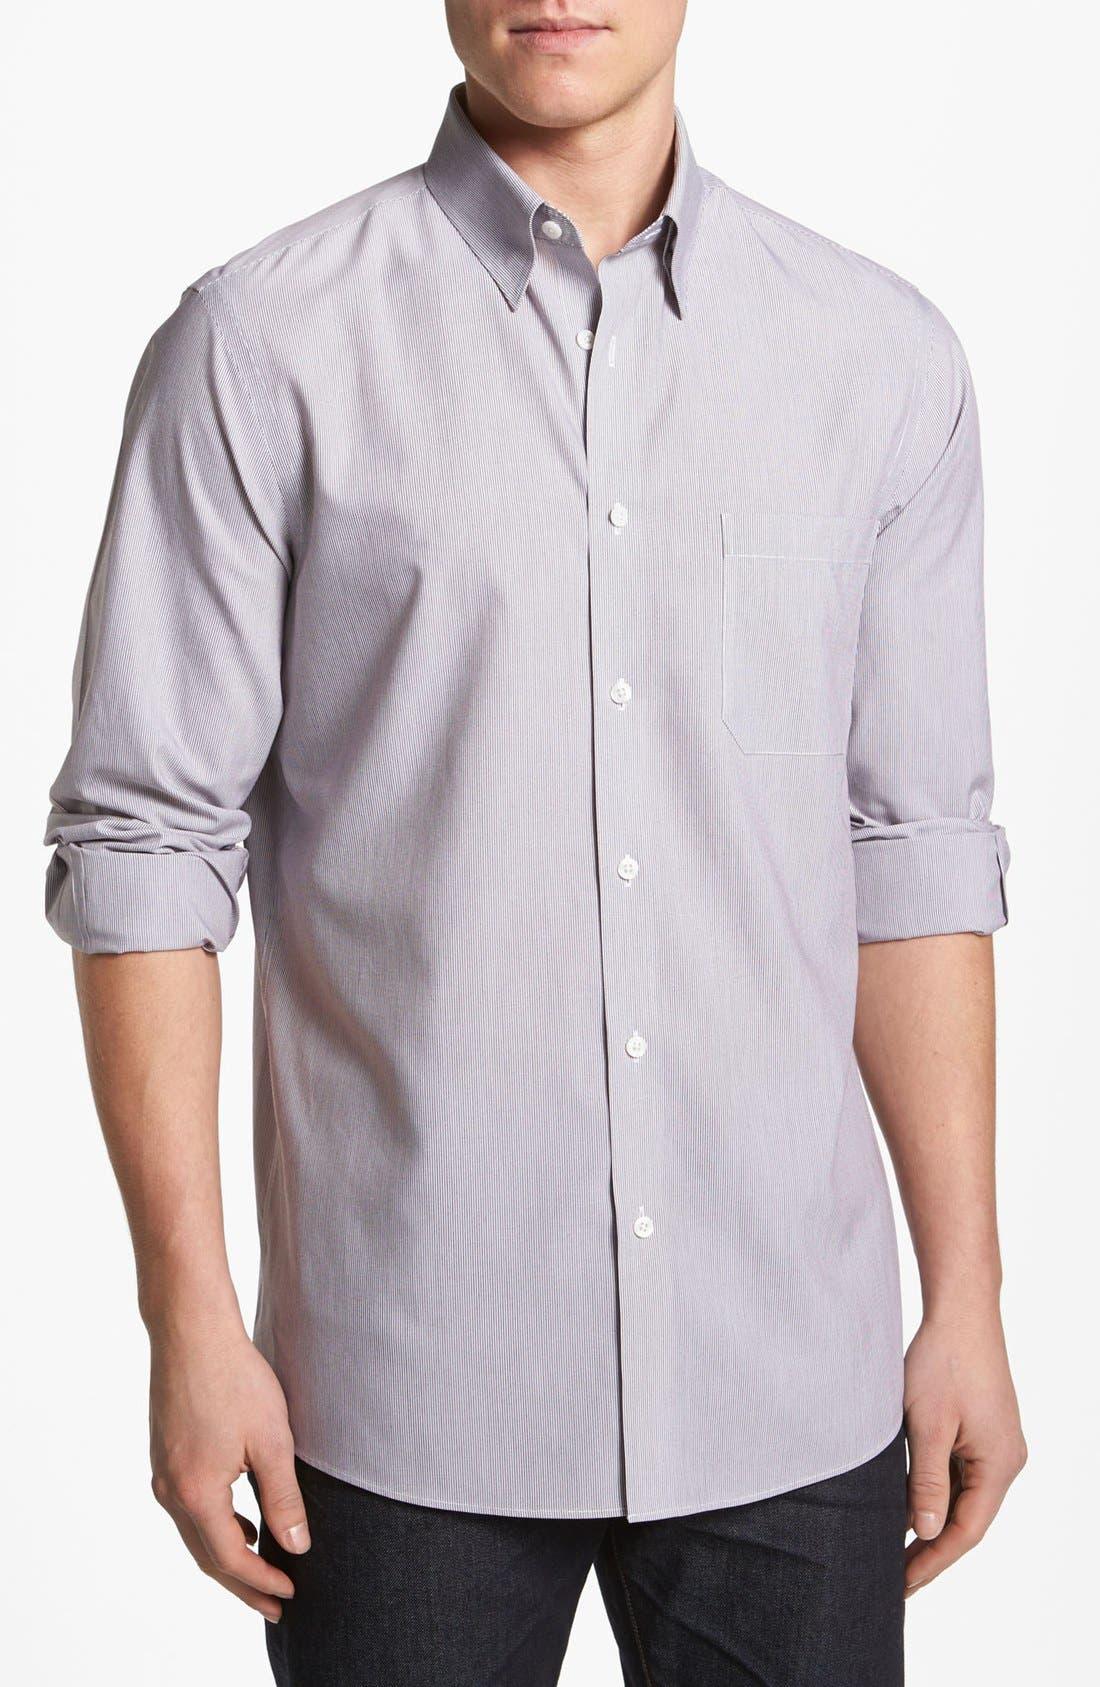 Alternate Image 1 Selected - Nordstrom Smartcare™ Striped Poplin Sport Shirt